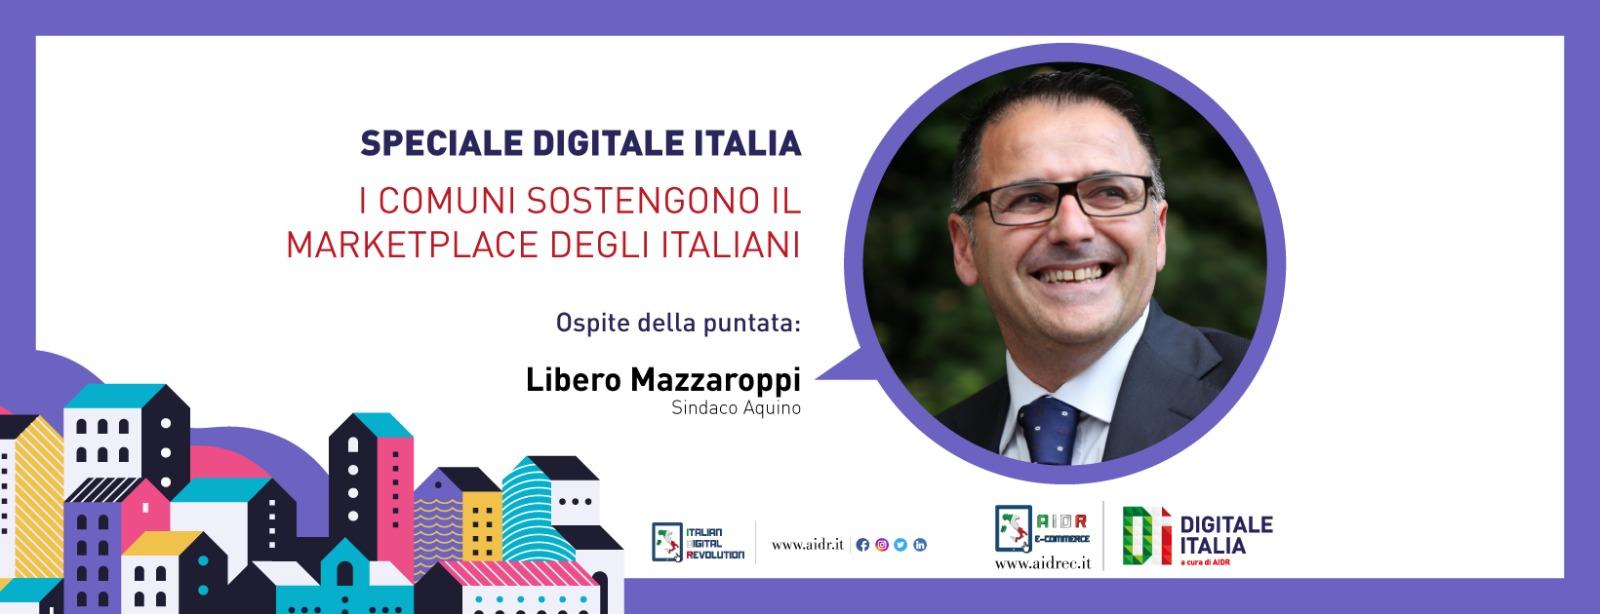 digitale-italia-aidr